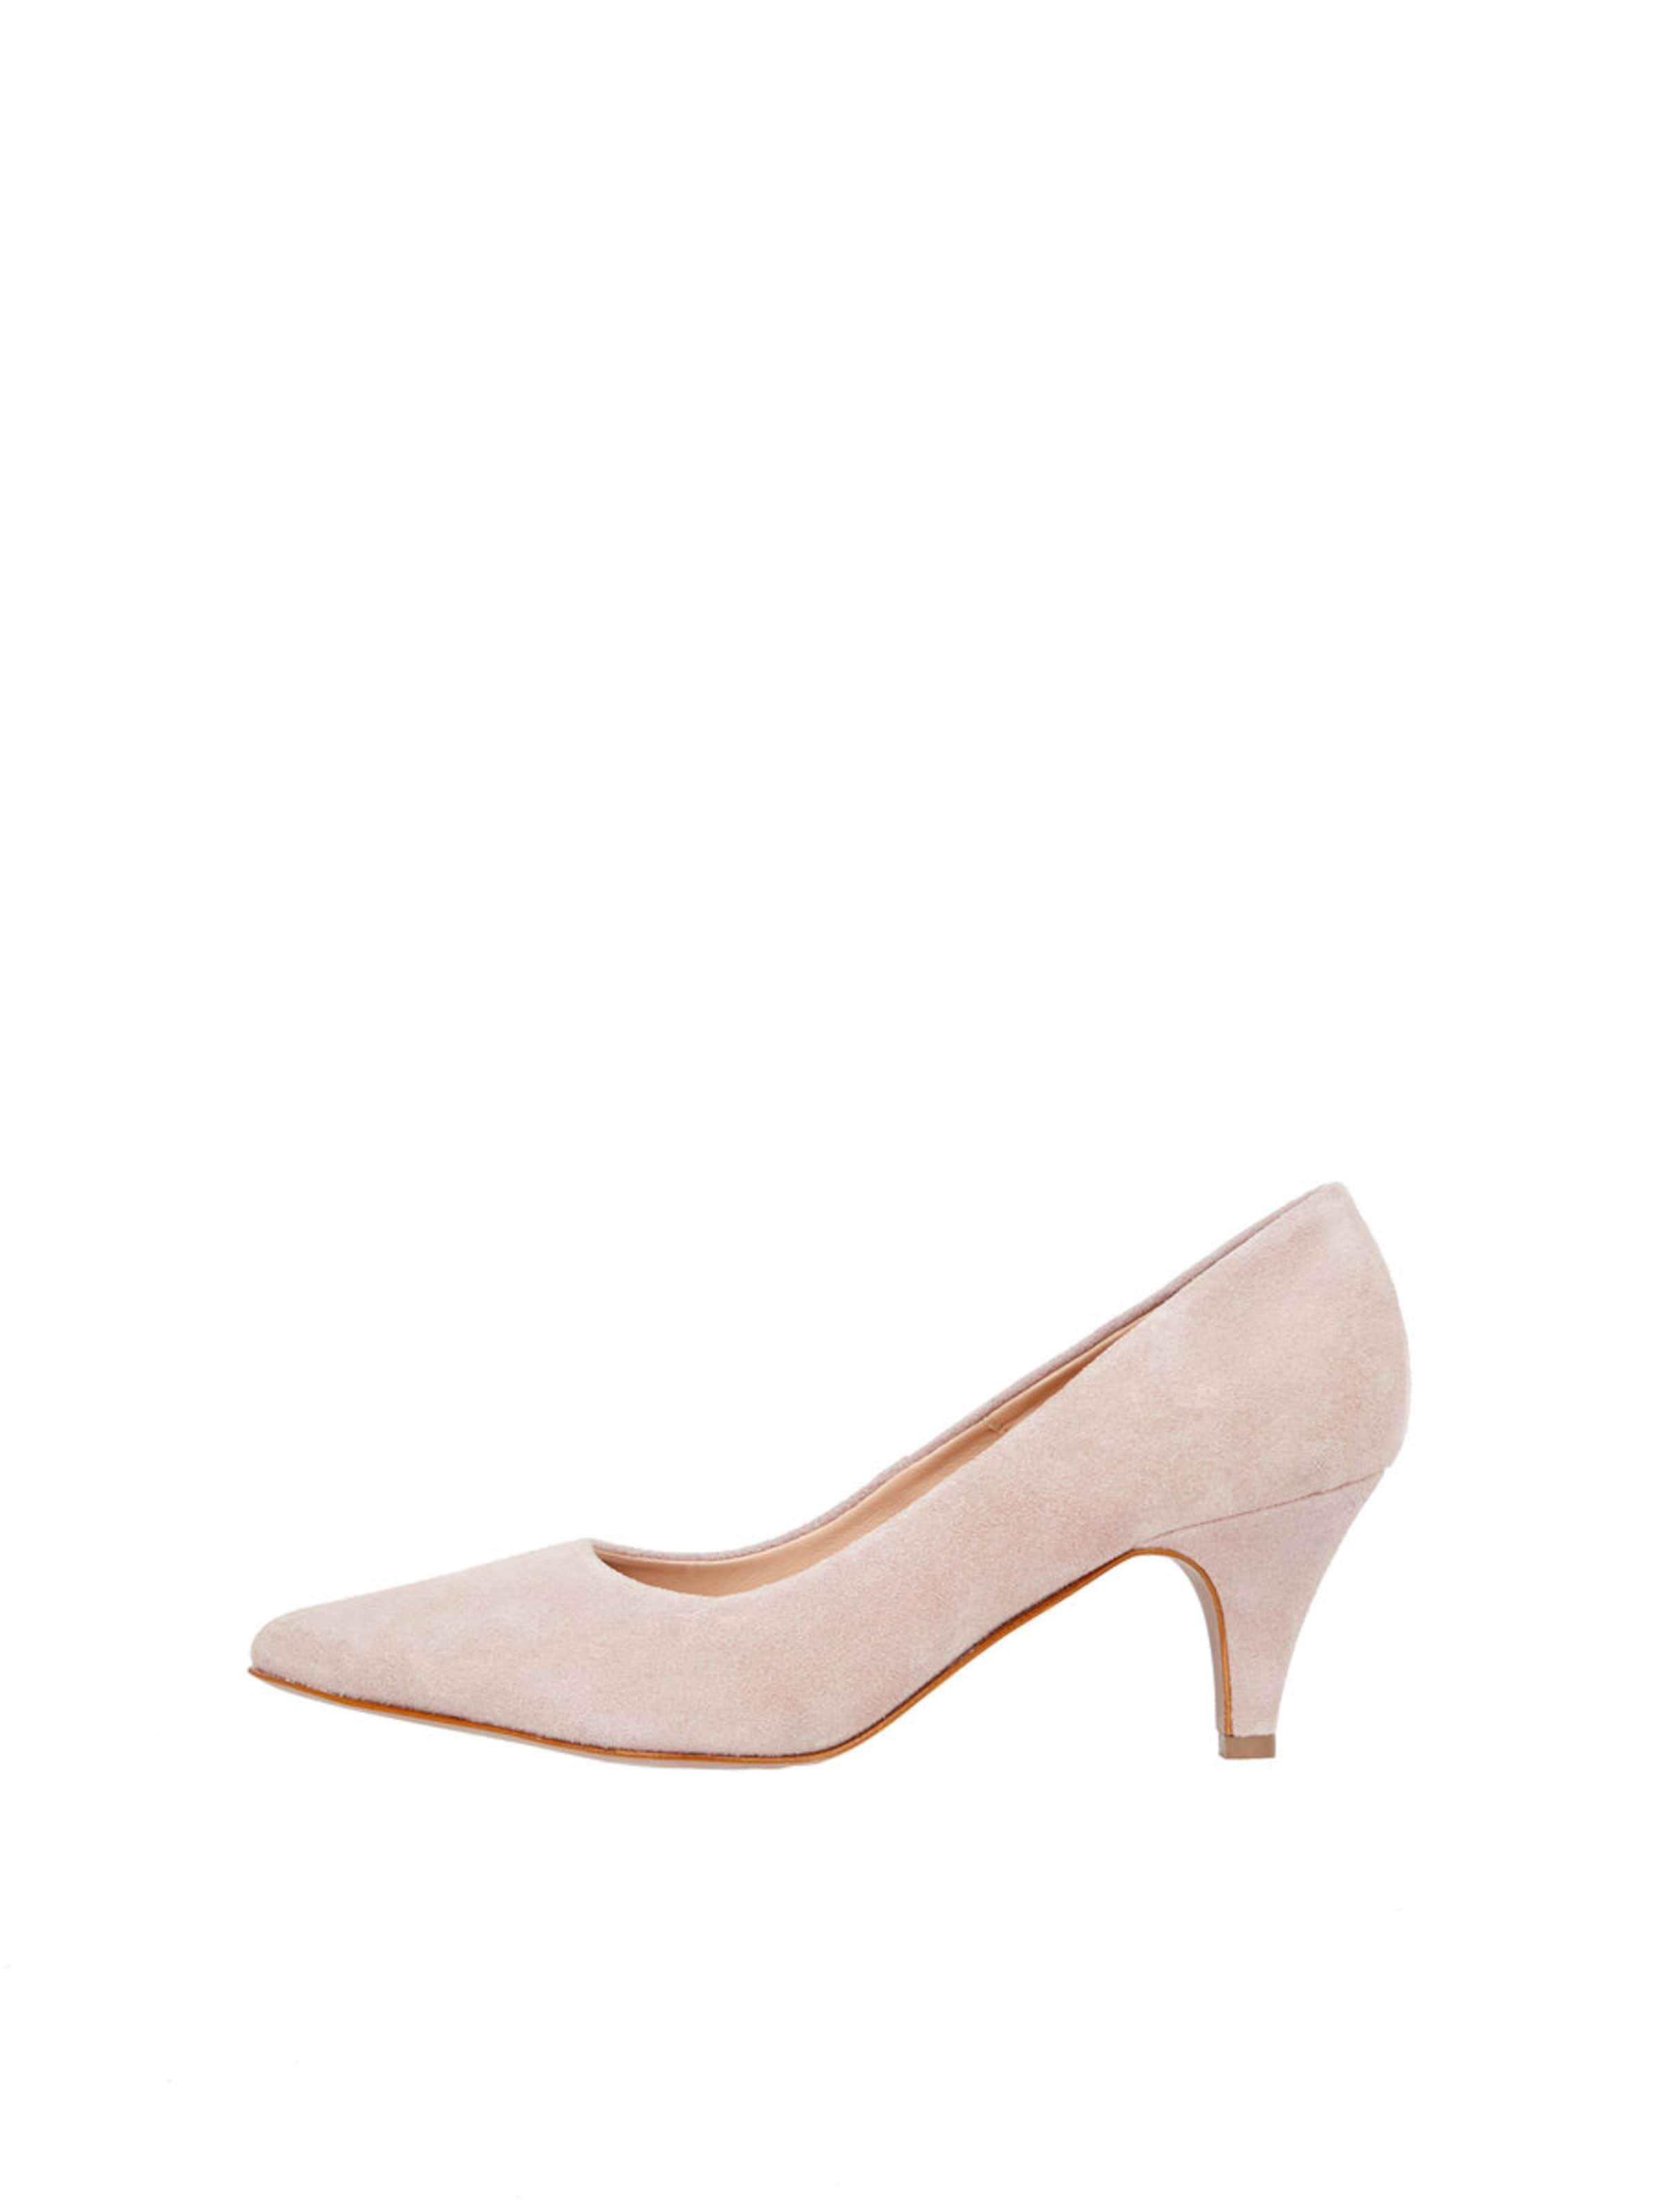 Haltbare Mode billige Schuhe Bianco | Klassische Pumps Schuhe Gut getragene Schuhe